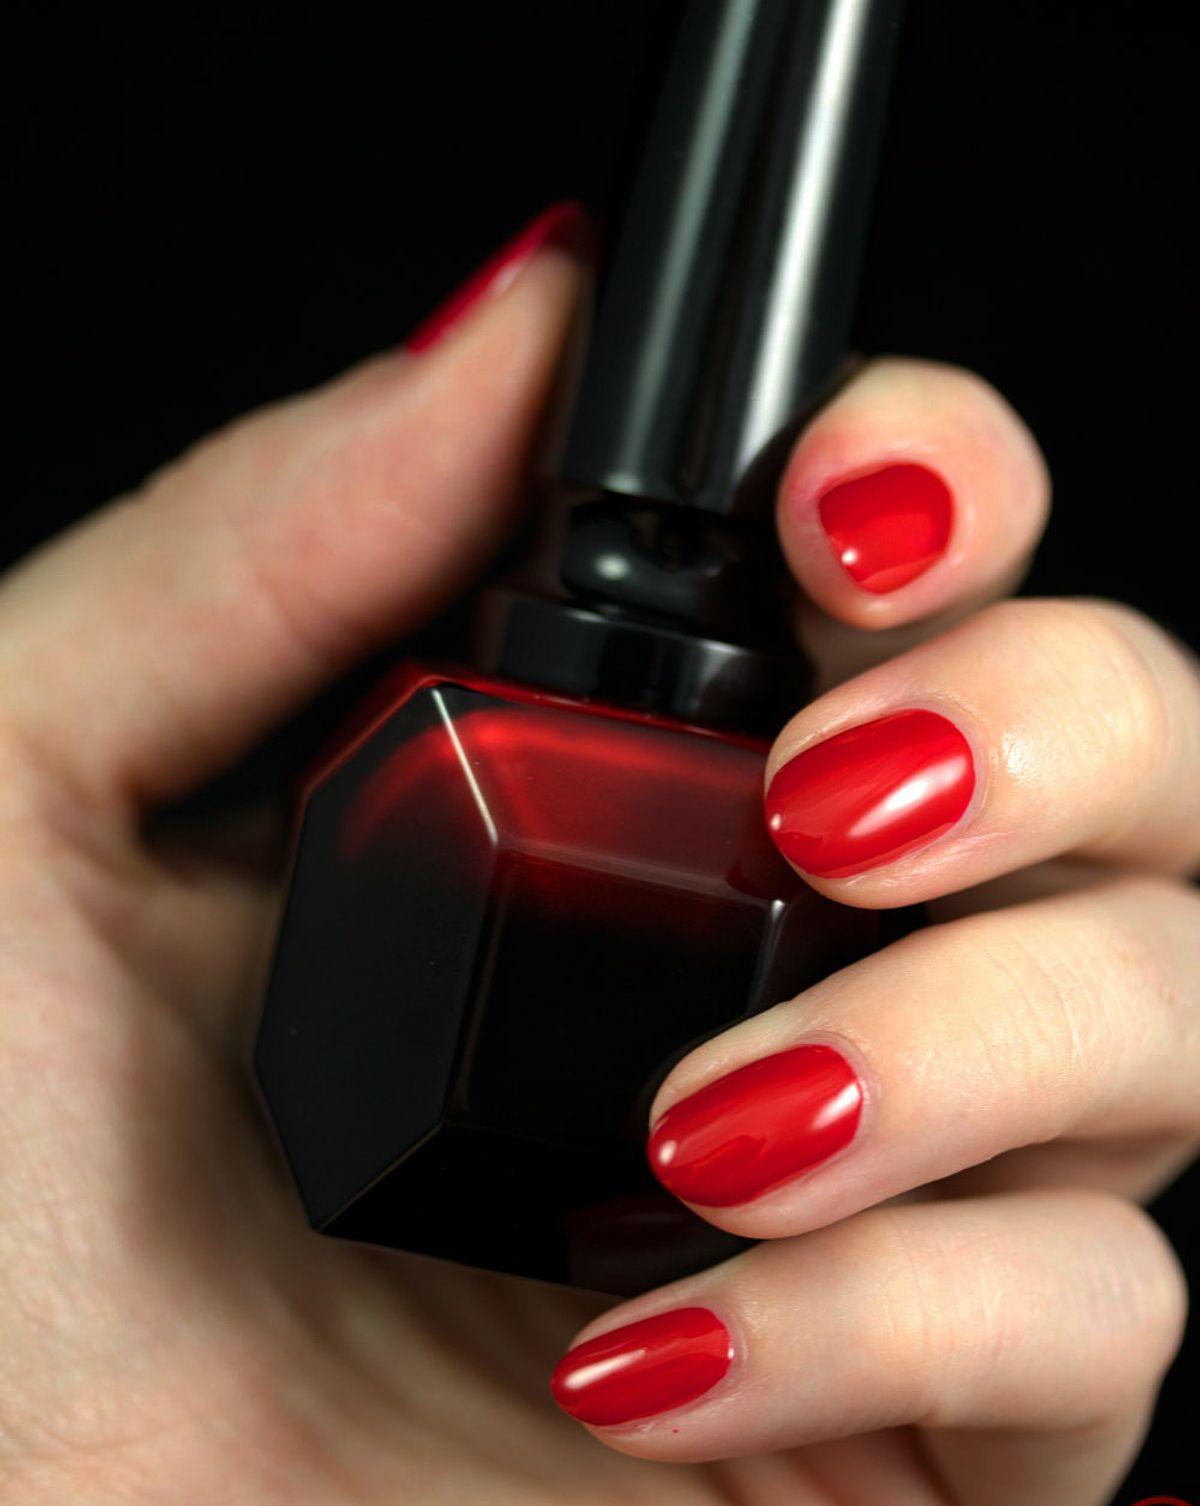 Christian Louboutin Nail Polish Rouge Louboutin Review | Art nails ...